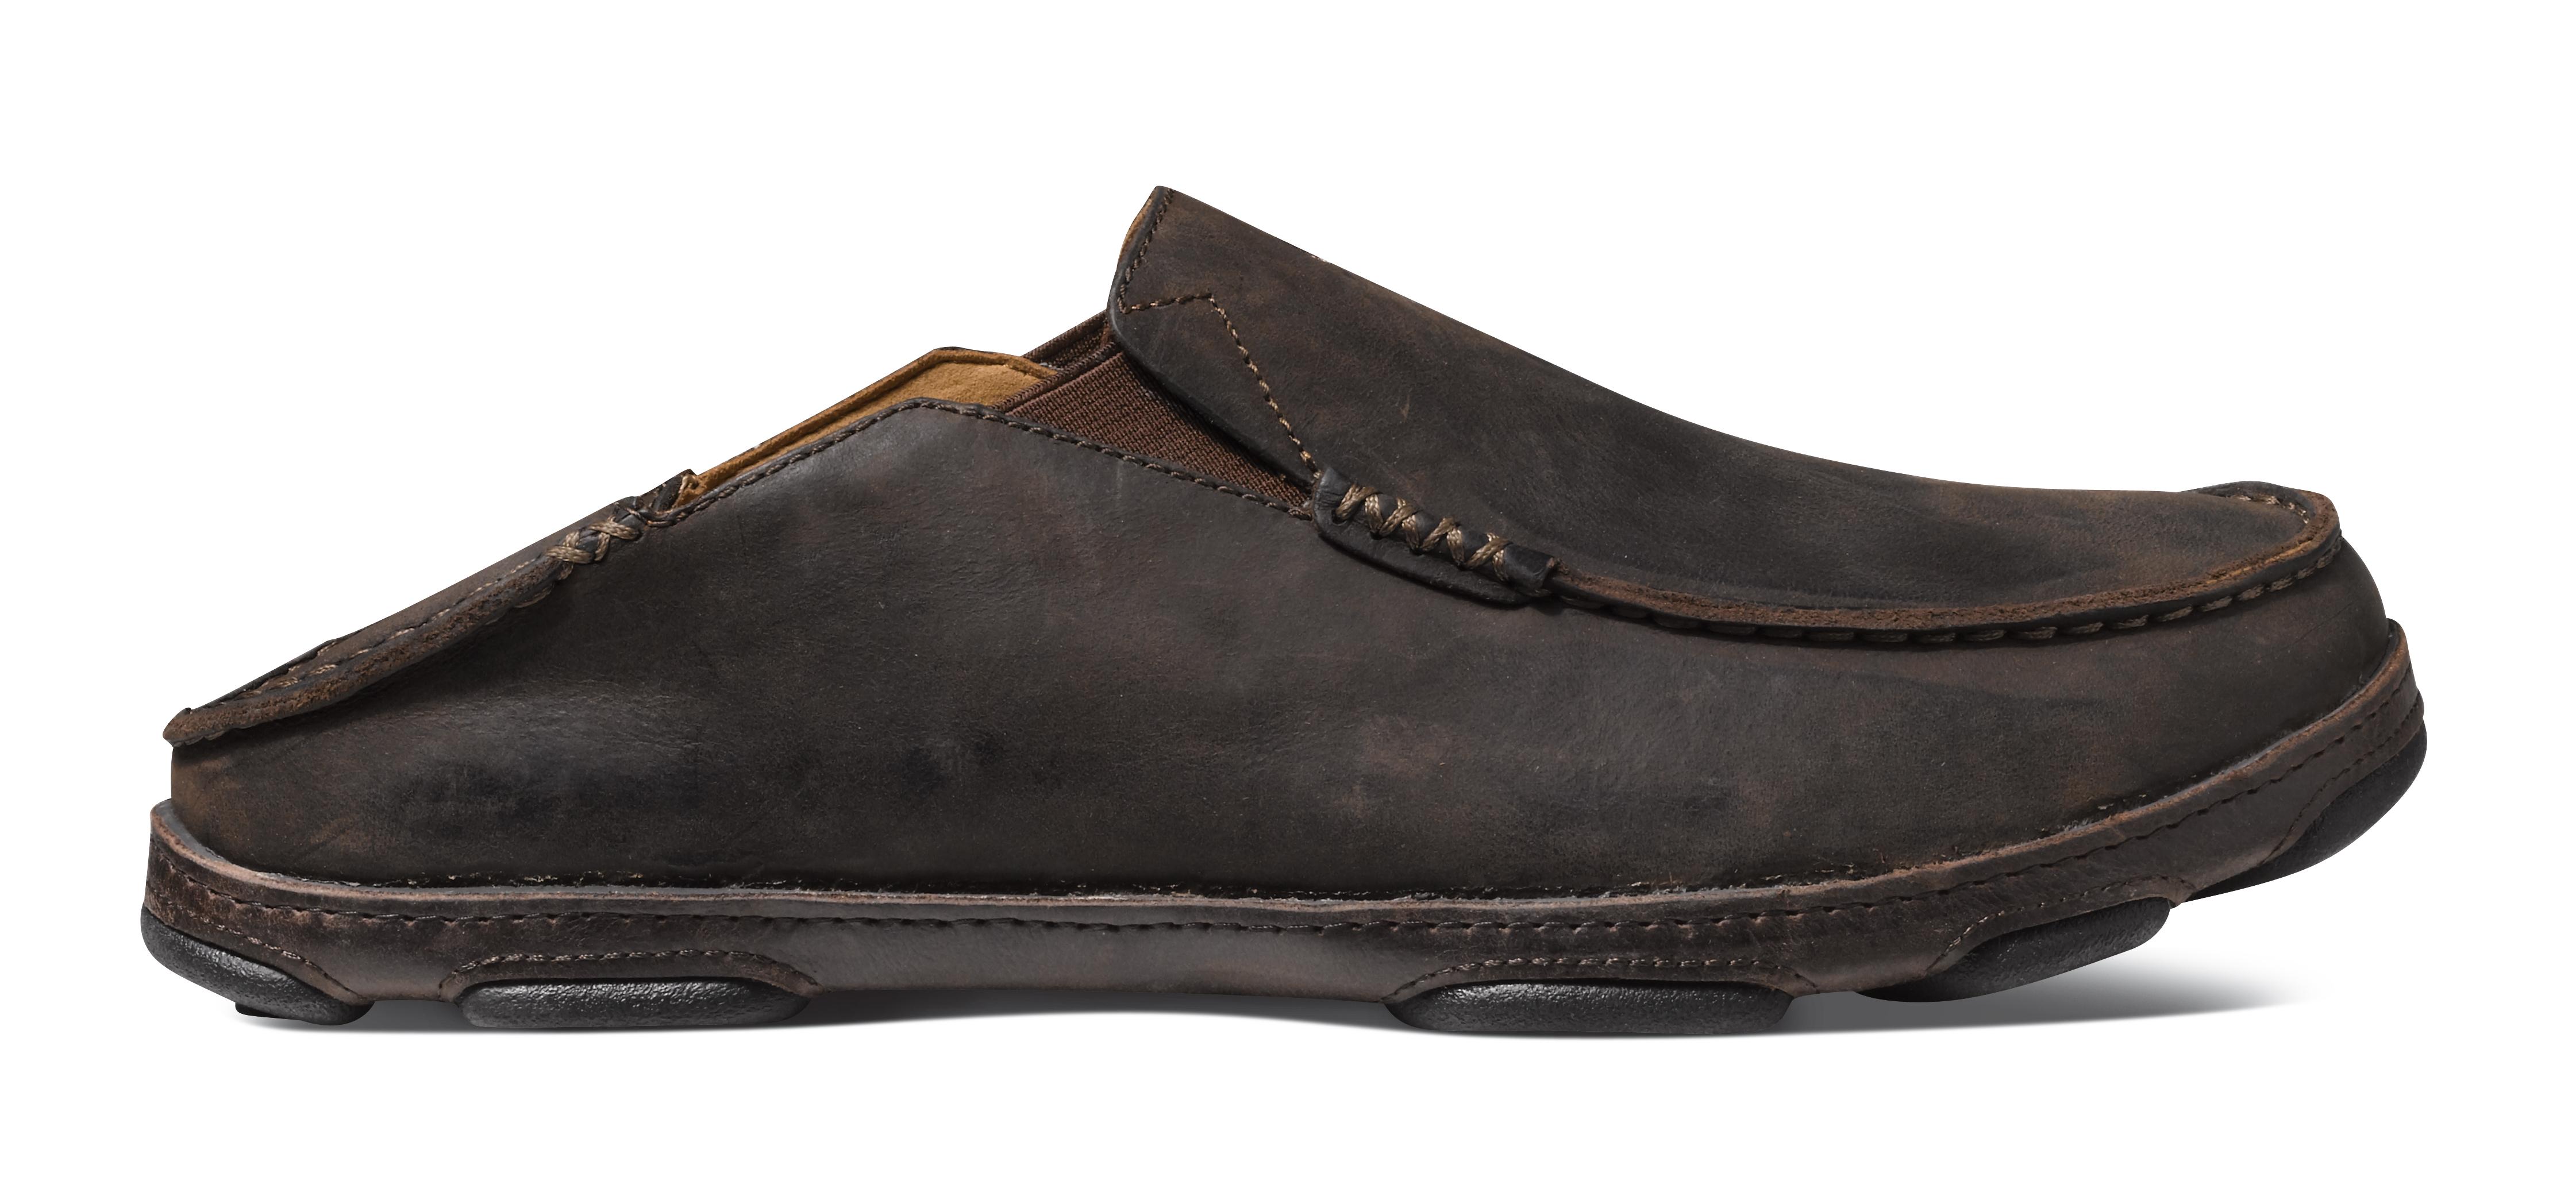 Olukai Olukai Shoes Men's Olukai Shoes Moloa Men's Moloa Shoes Moloa DHYWE29I